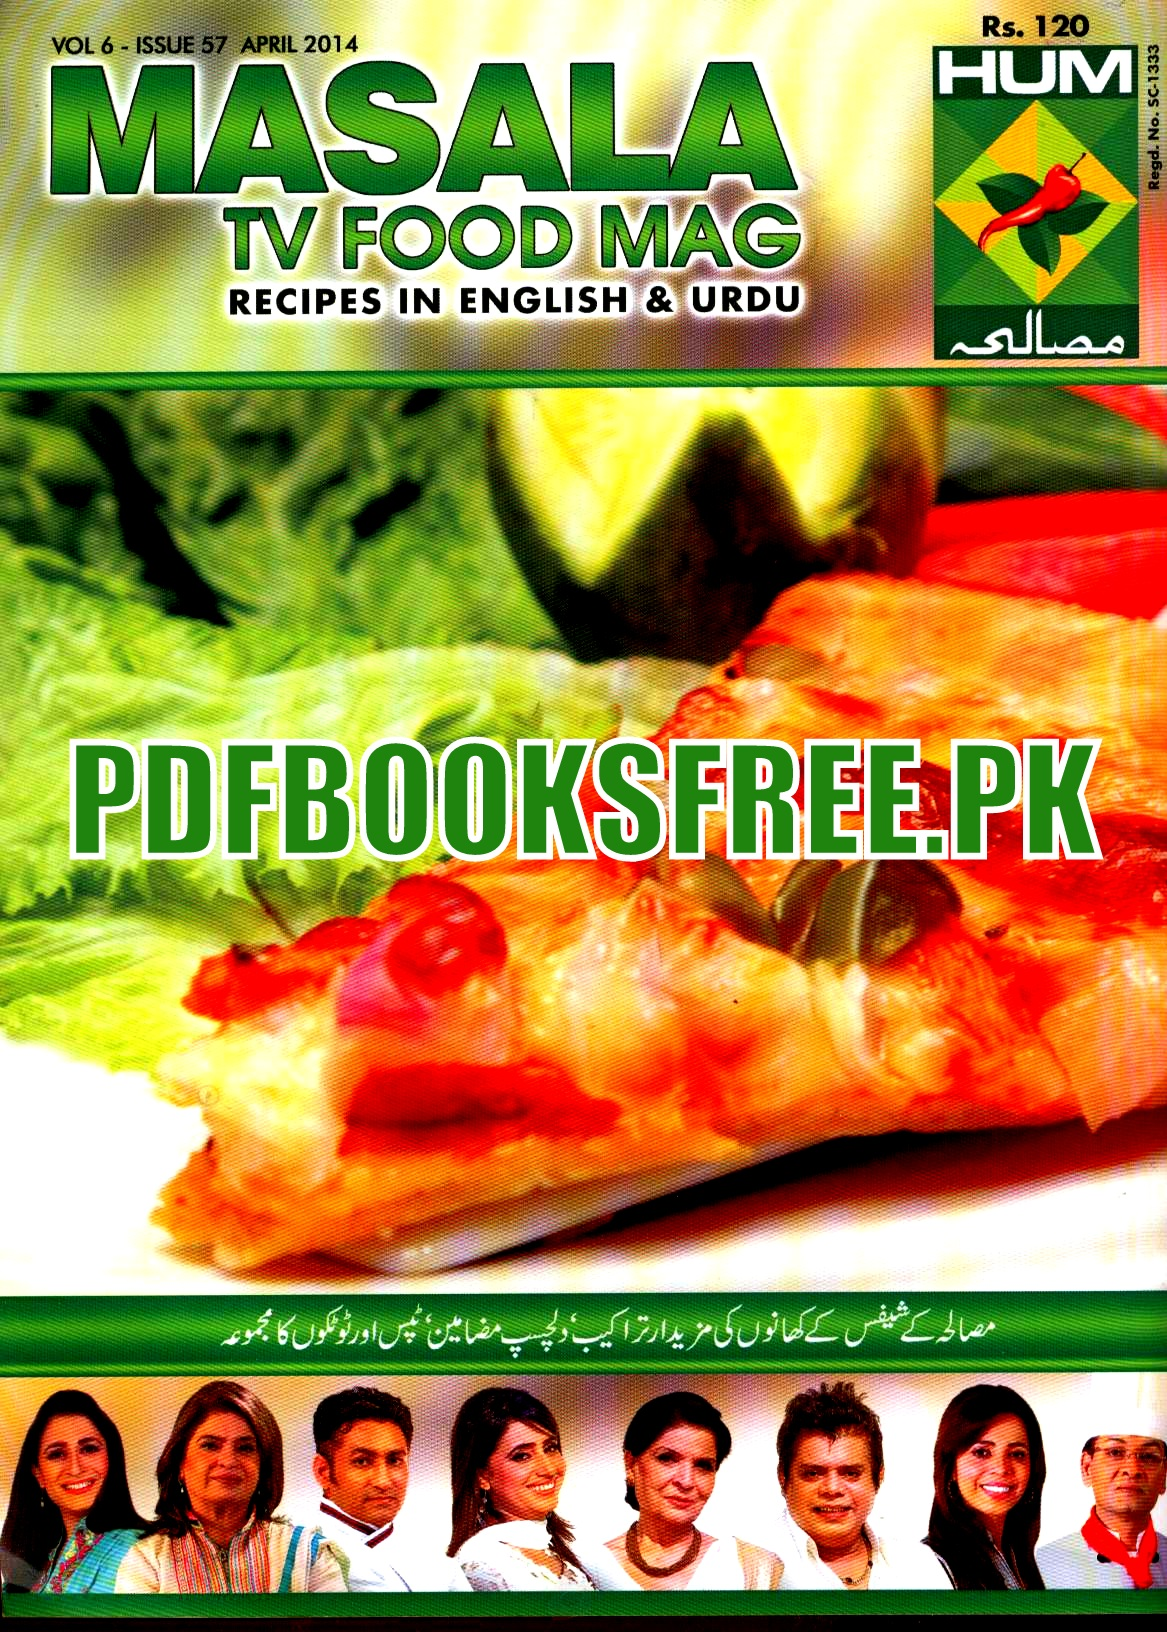 Masala tv food magazine april 2014 pdf free download forumfinder Choice Image